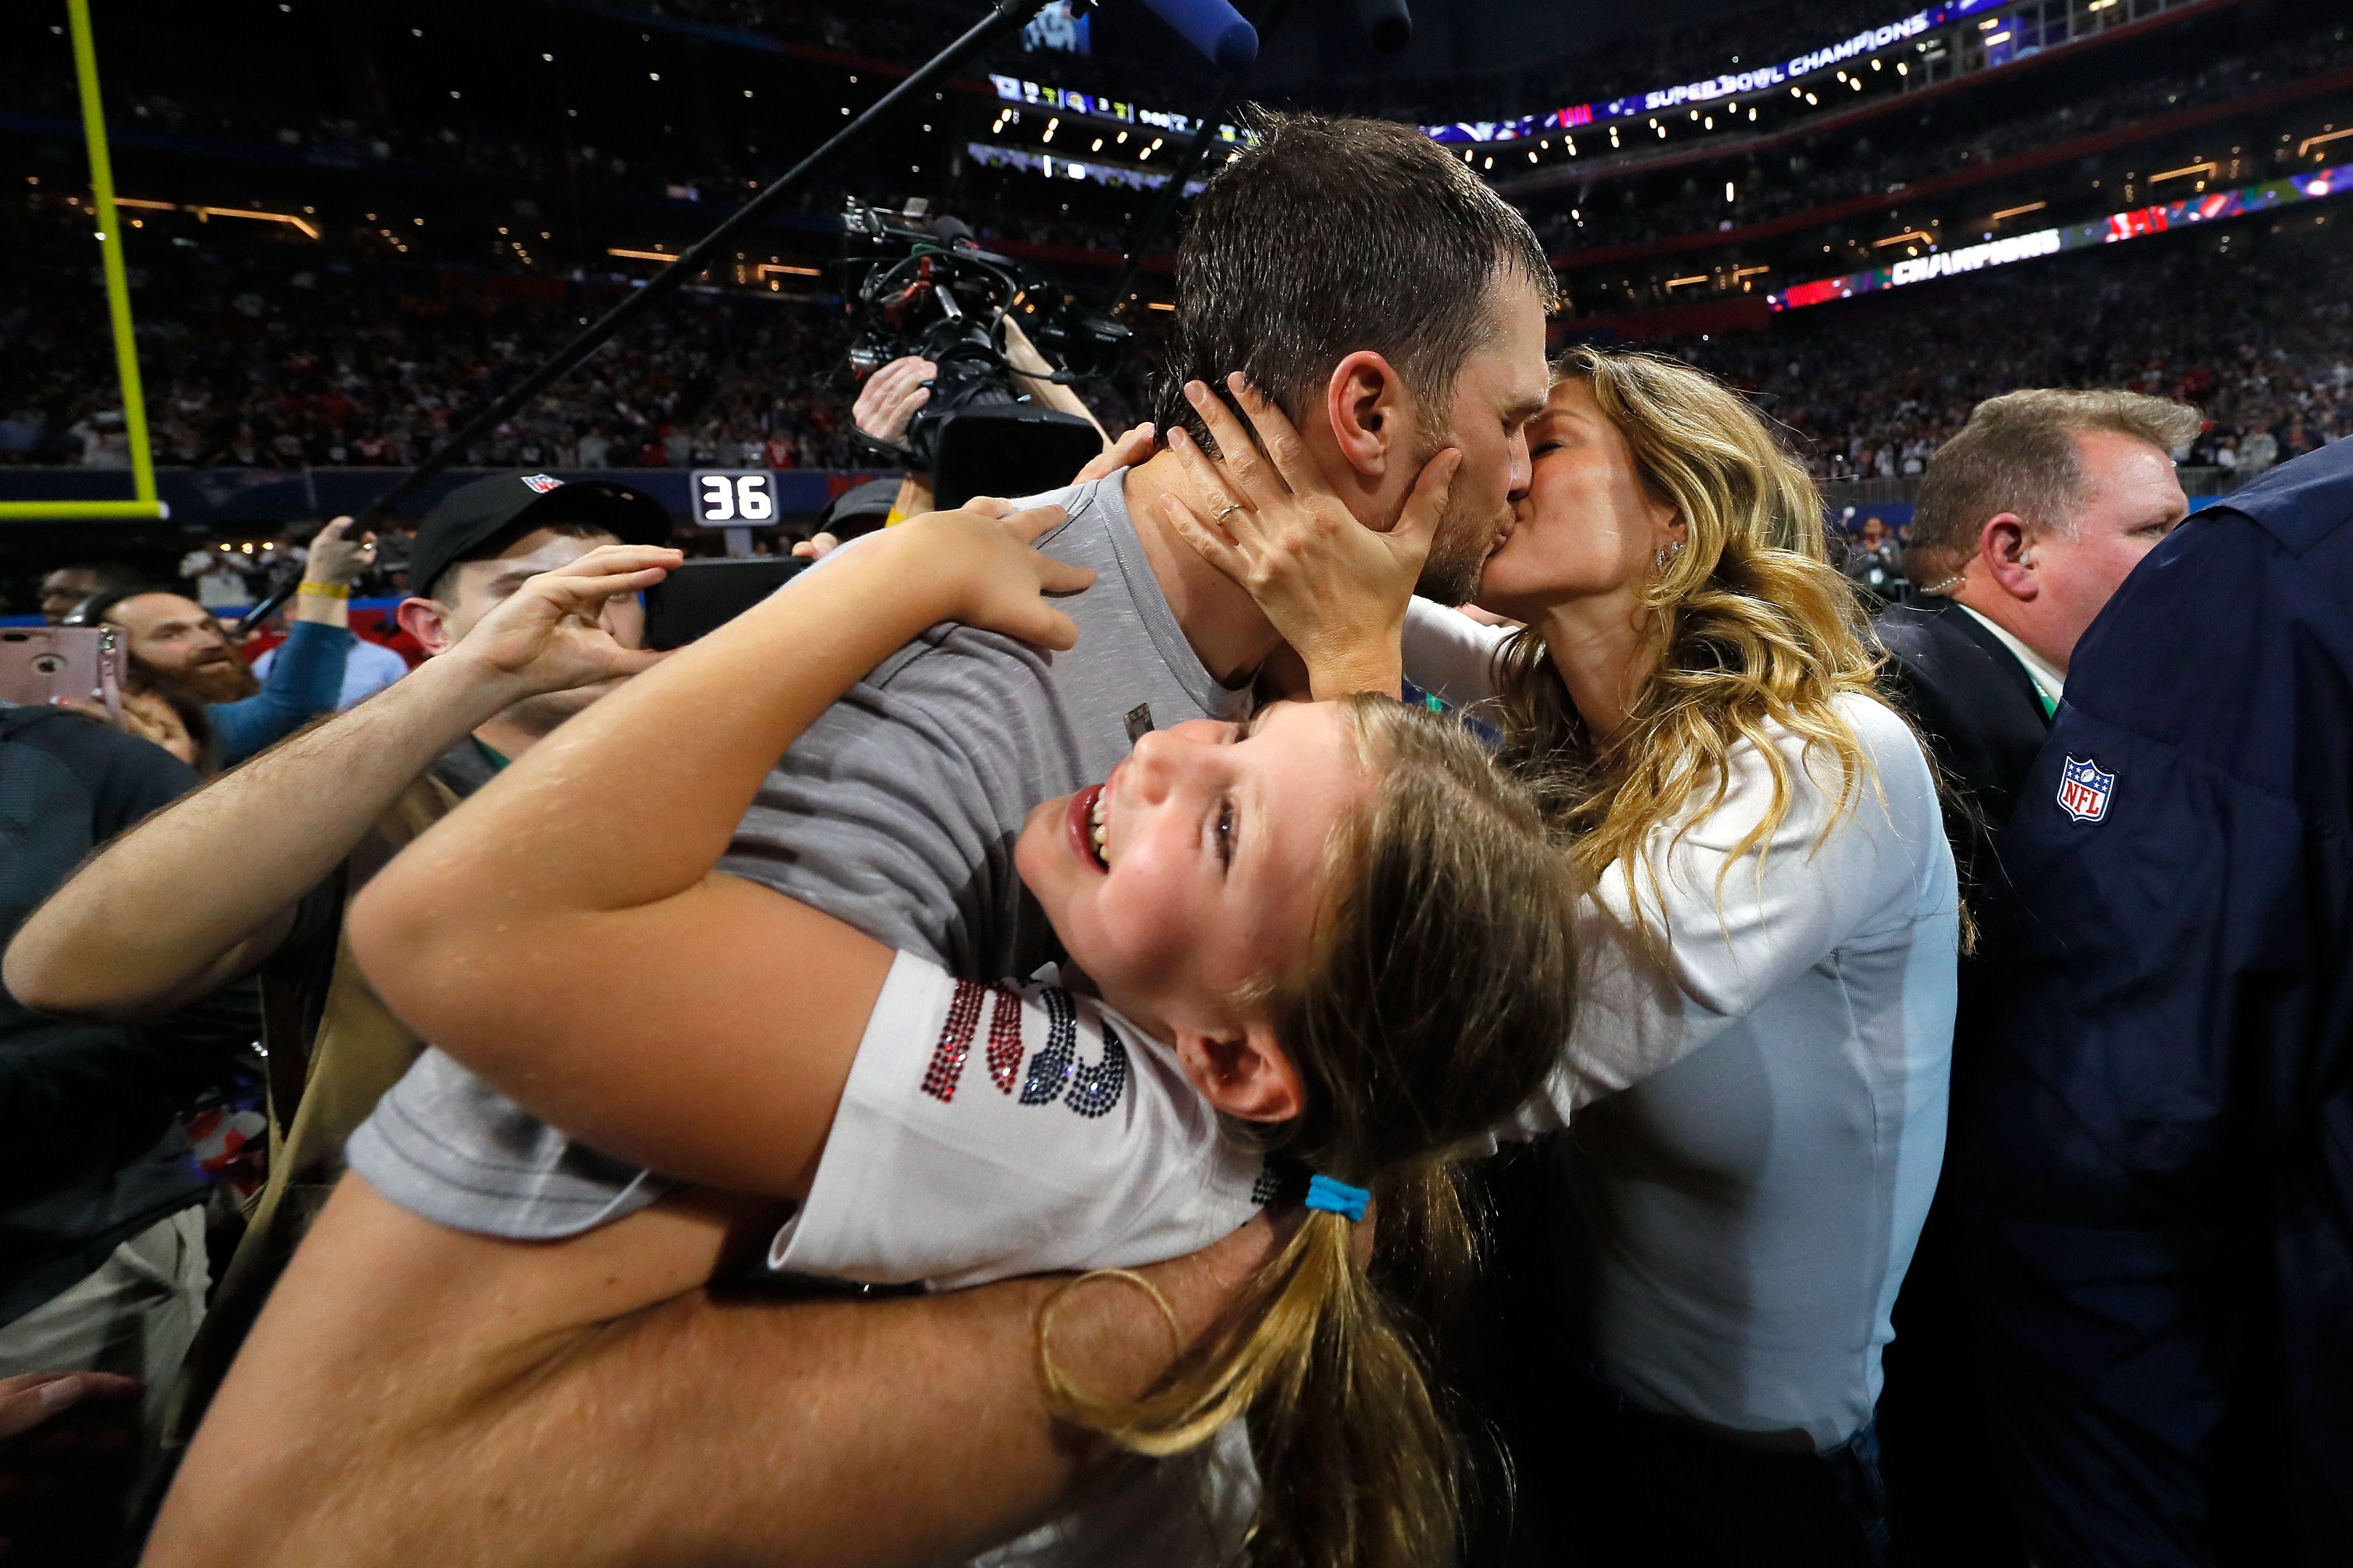 How Gisele Bundchen Congratulated Tom Brady For 2019 Super Bowl Win Gisele S Super Bowl Instagram History